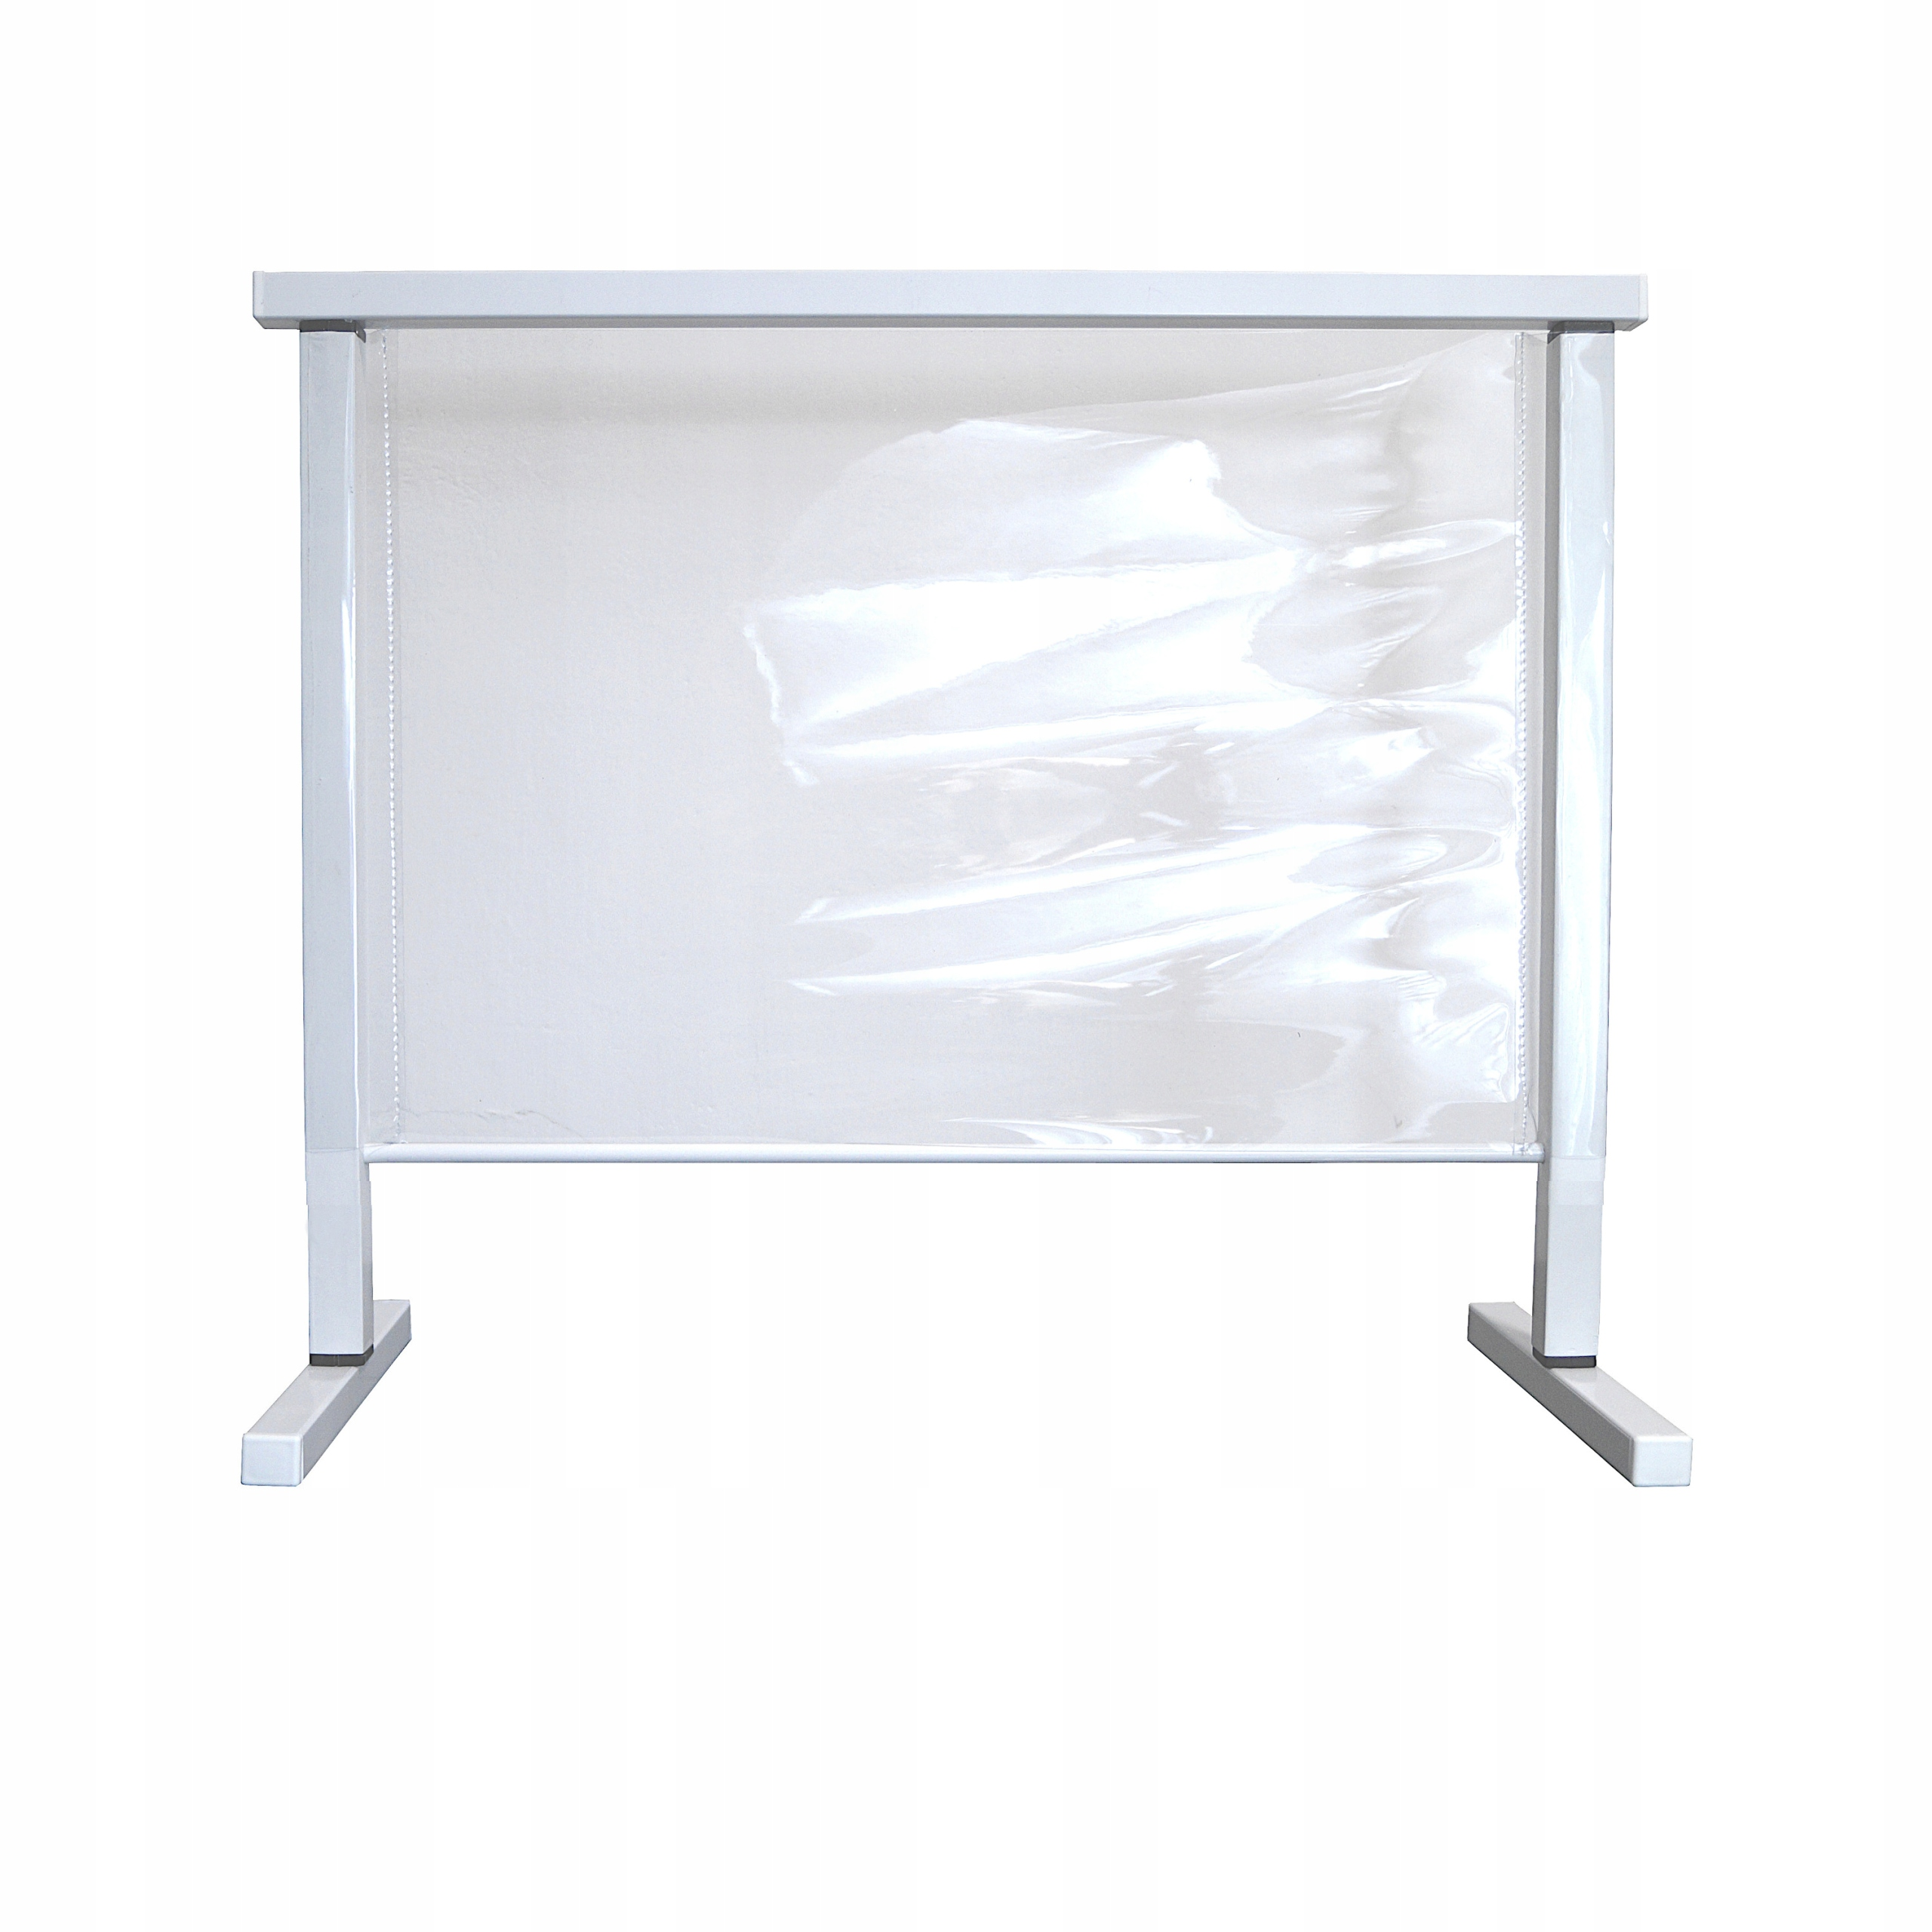 Osłona antywirusowa folia PCV na biurko-70 x 80cm